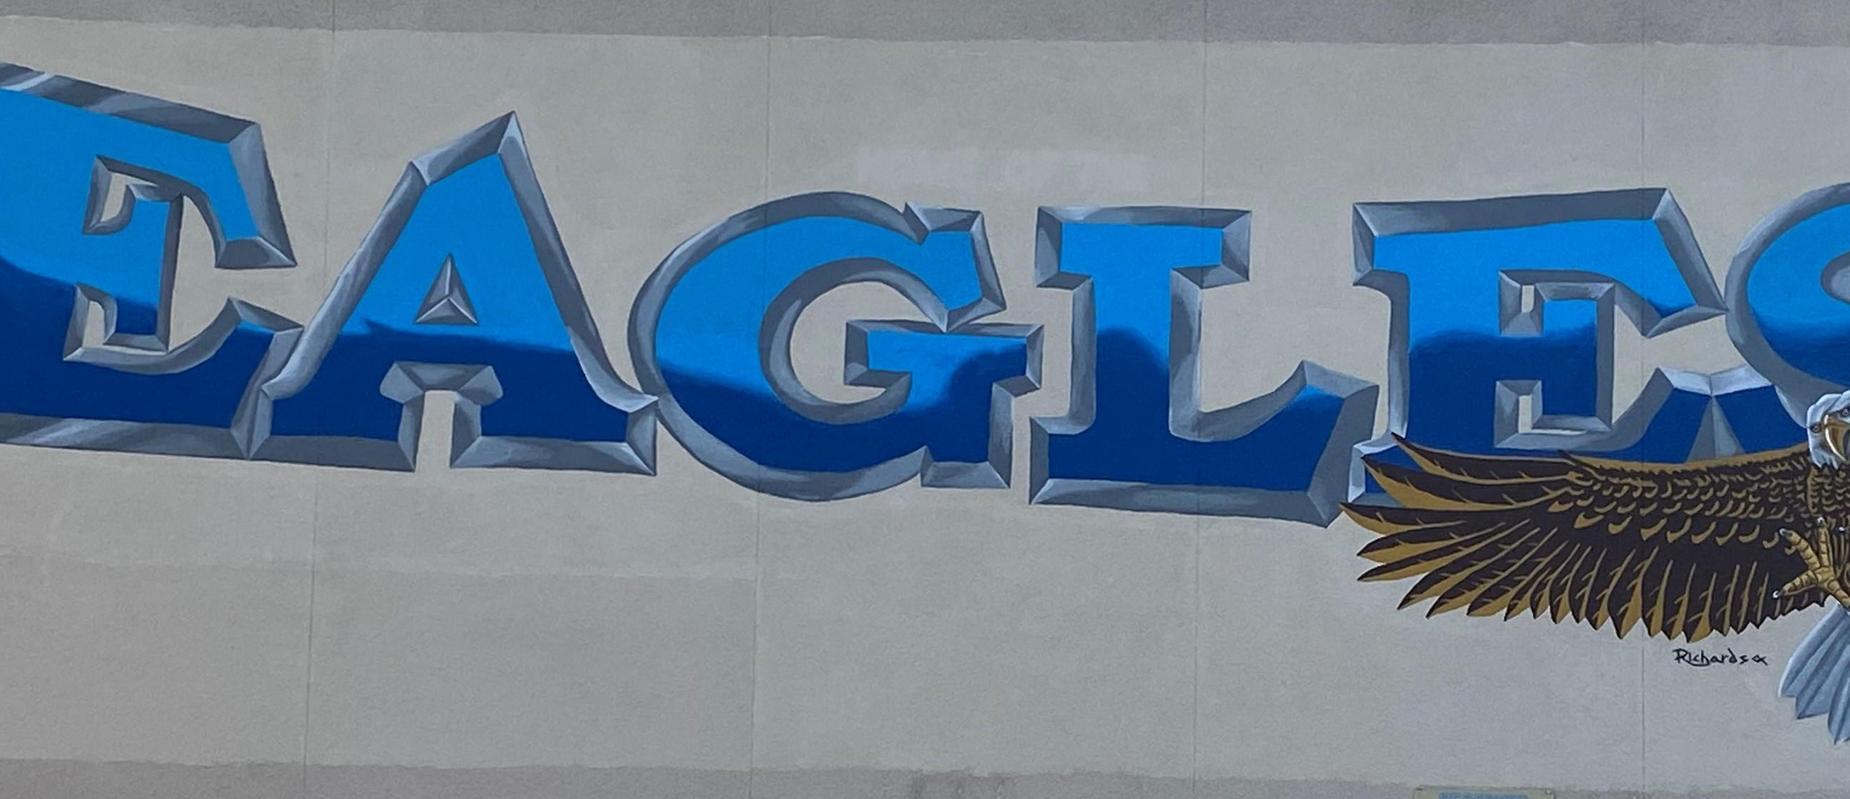 Eagle mural